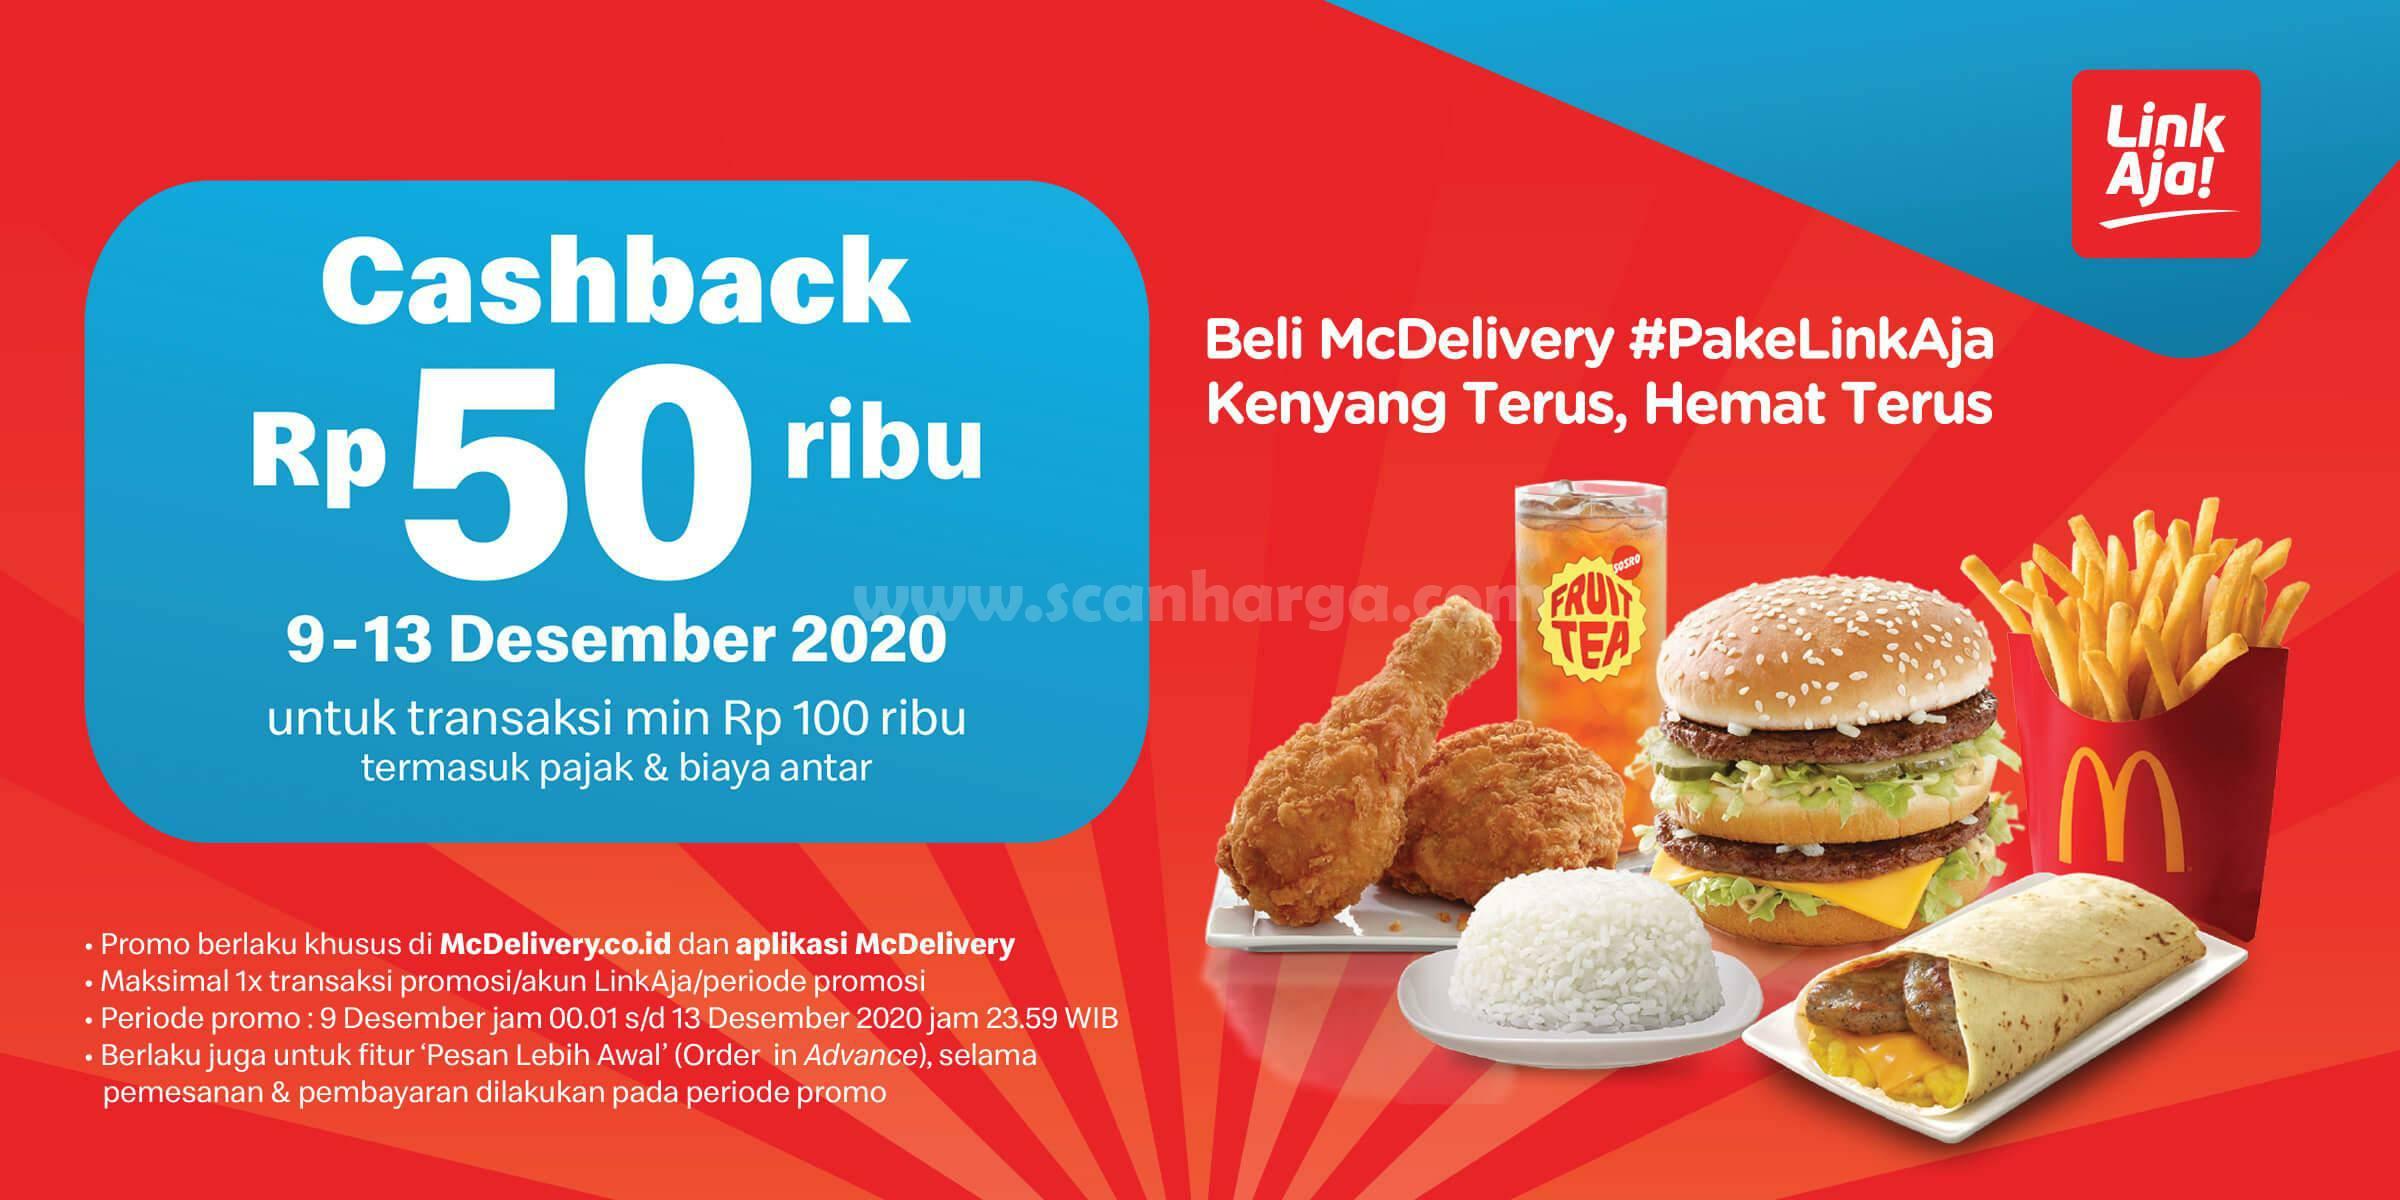 McDonalds Promo Cashback 50% dengan LinkAja [9 - 13 Desember 2020]